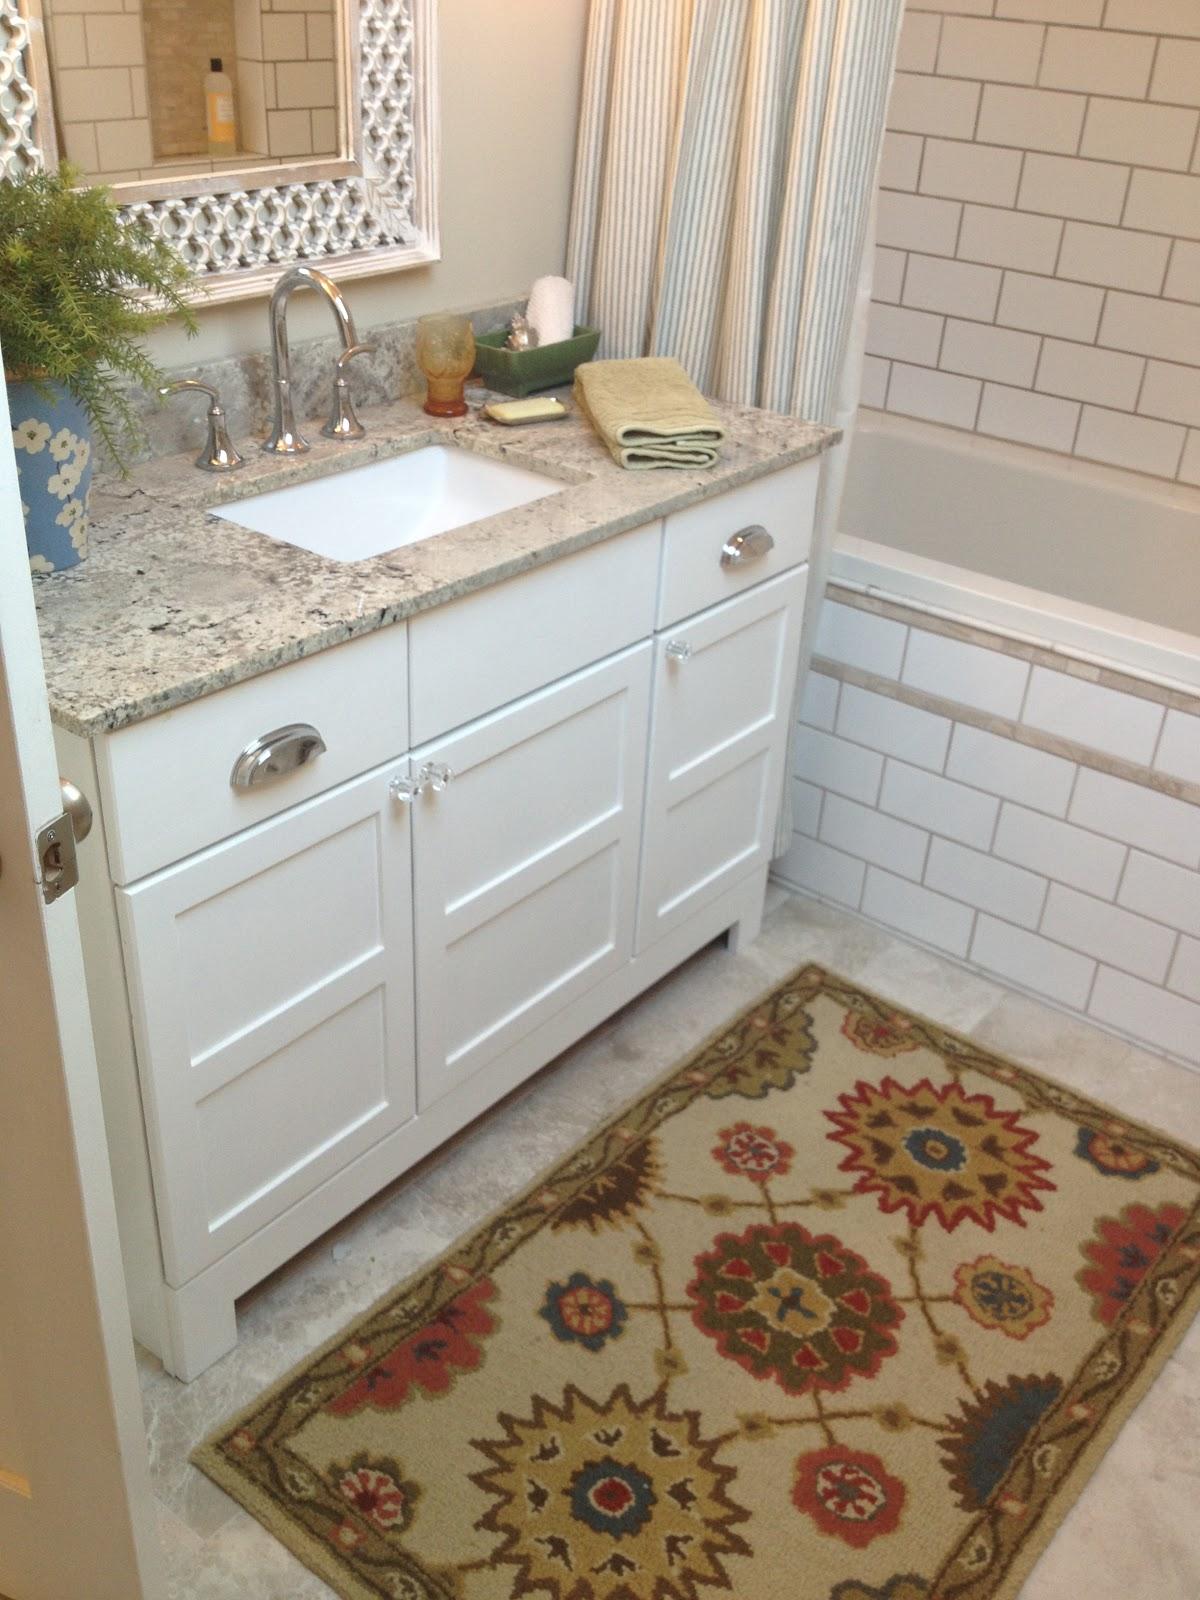 Amy scott interior design bathroom tour attic renovation for Megan u bathroom tour